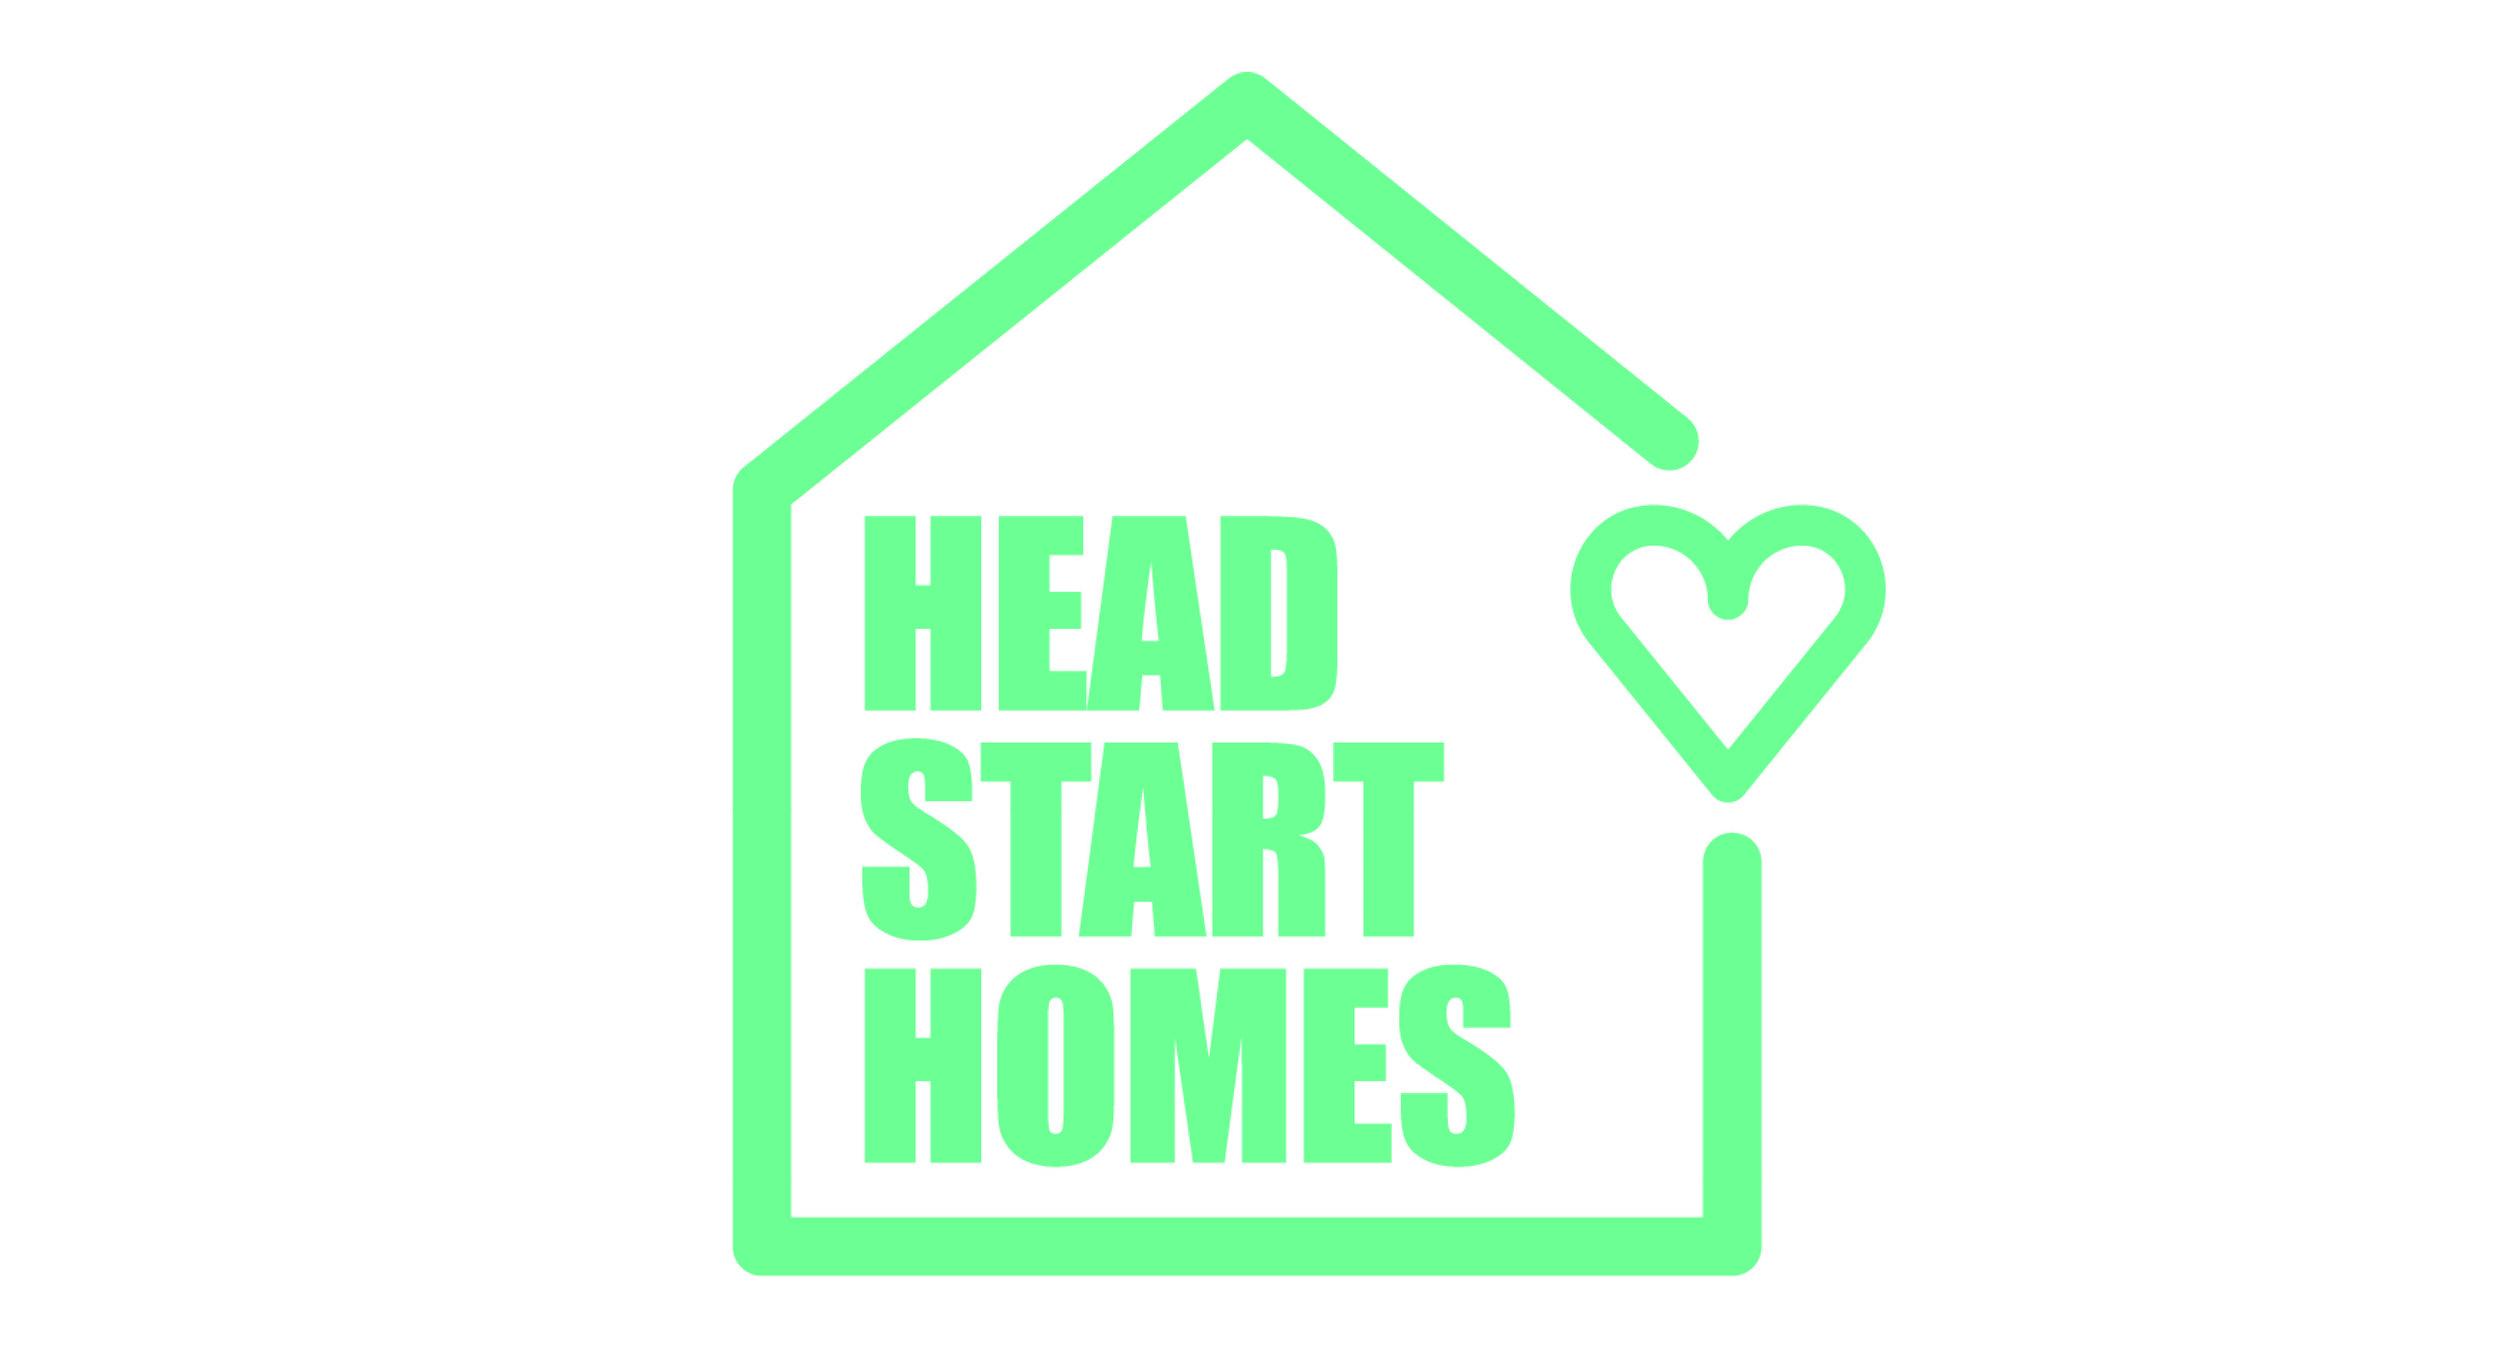 HSH logo hires.jpg